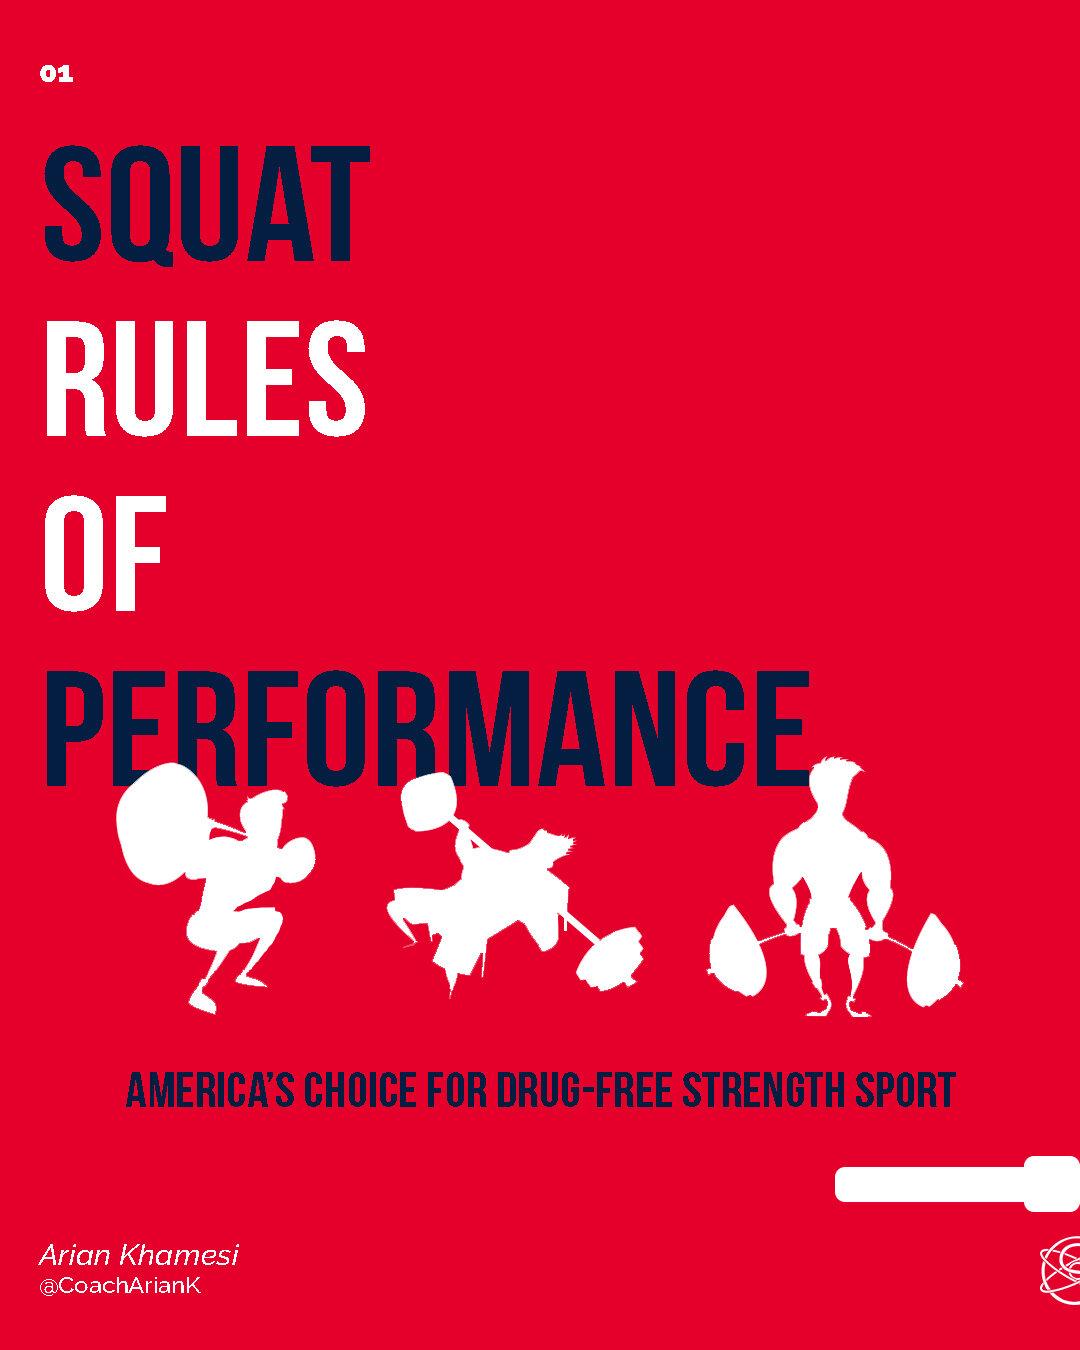 Squat-Rules_01.jpg